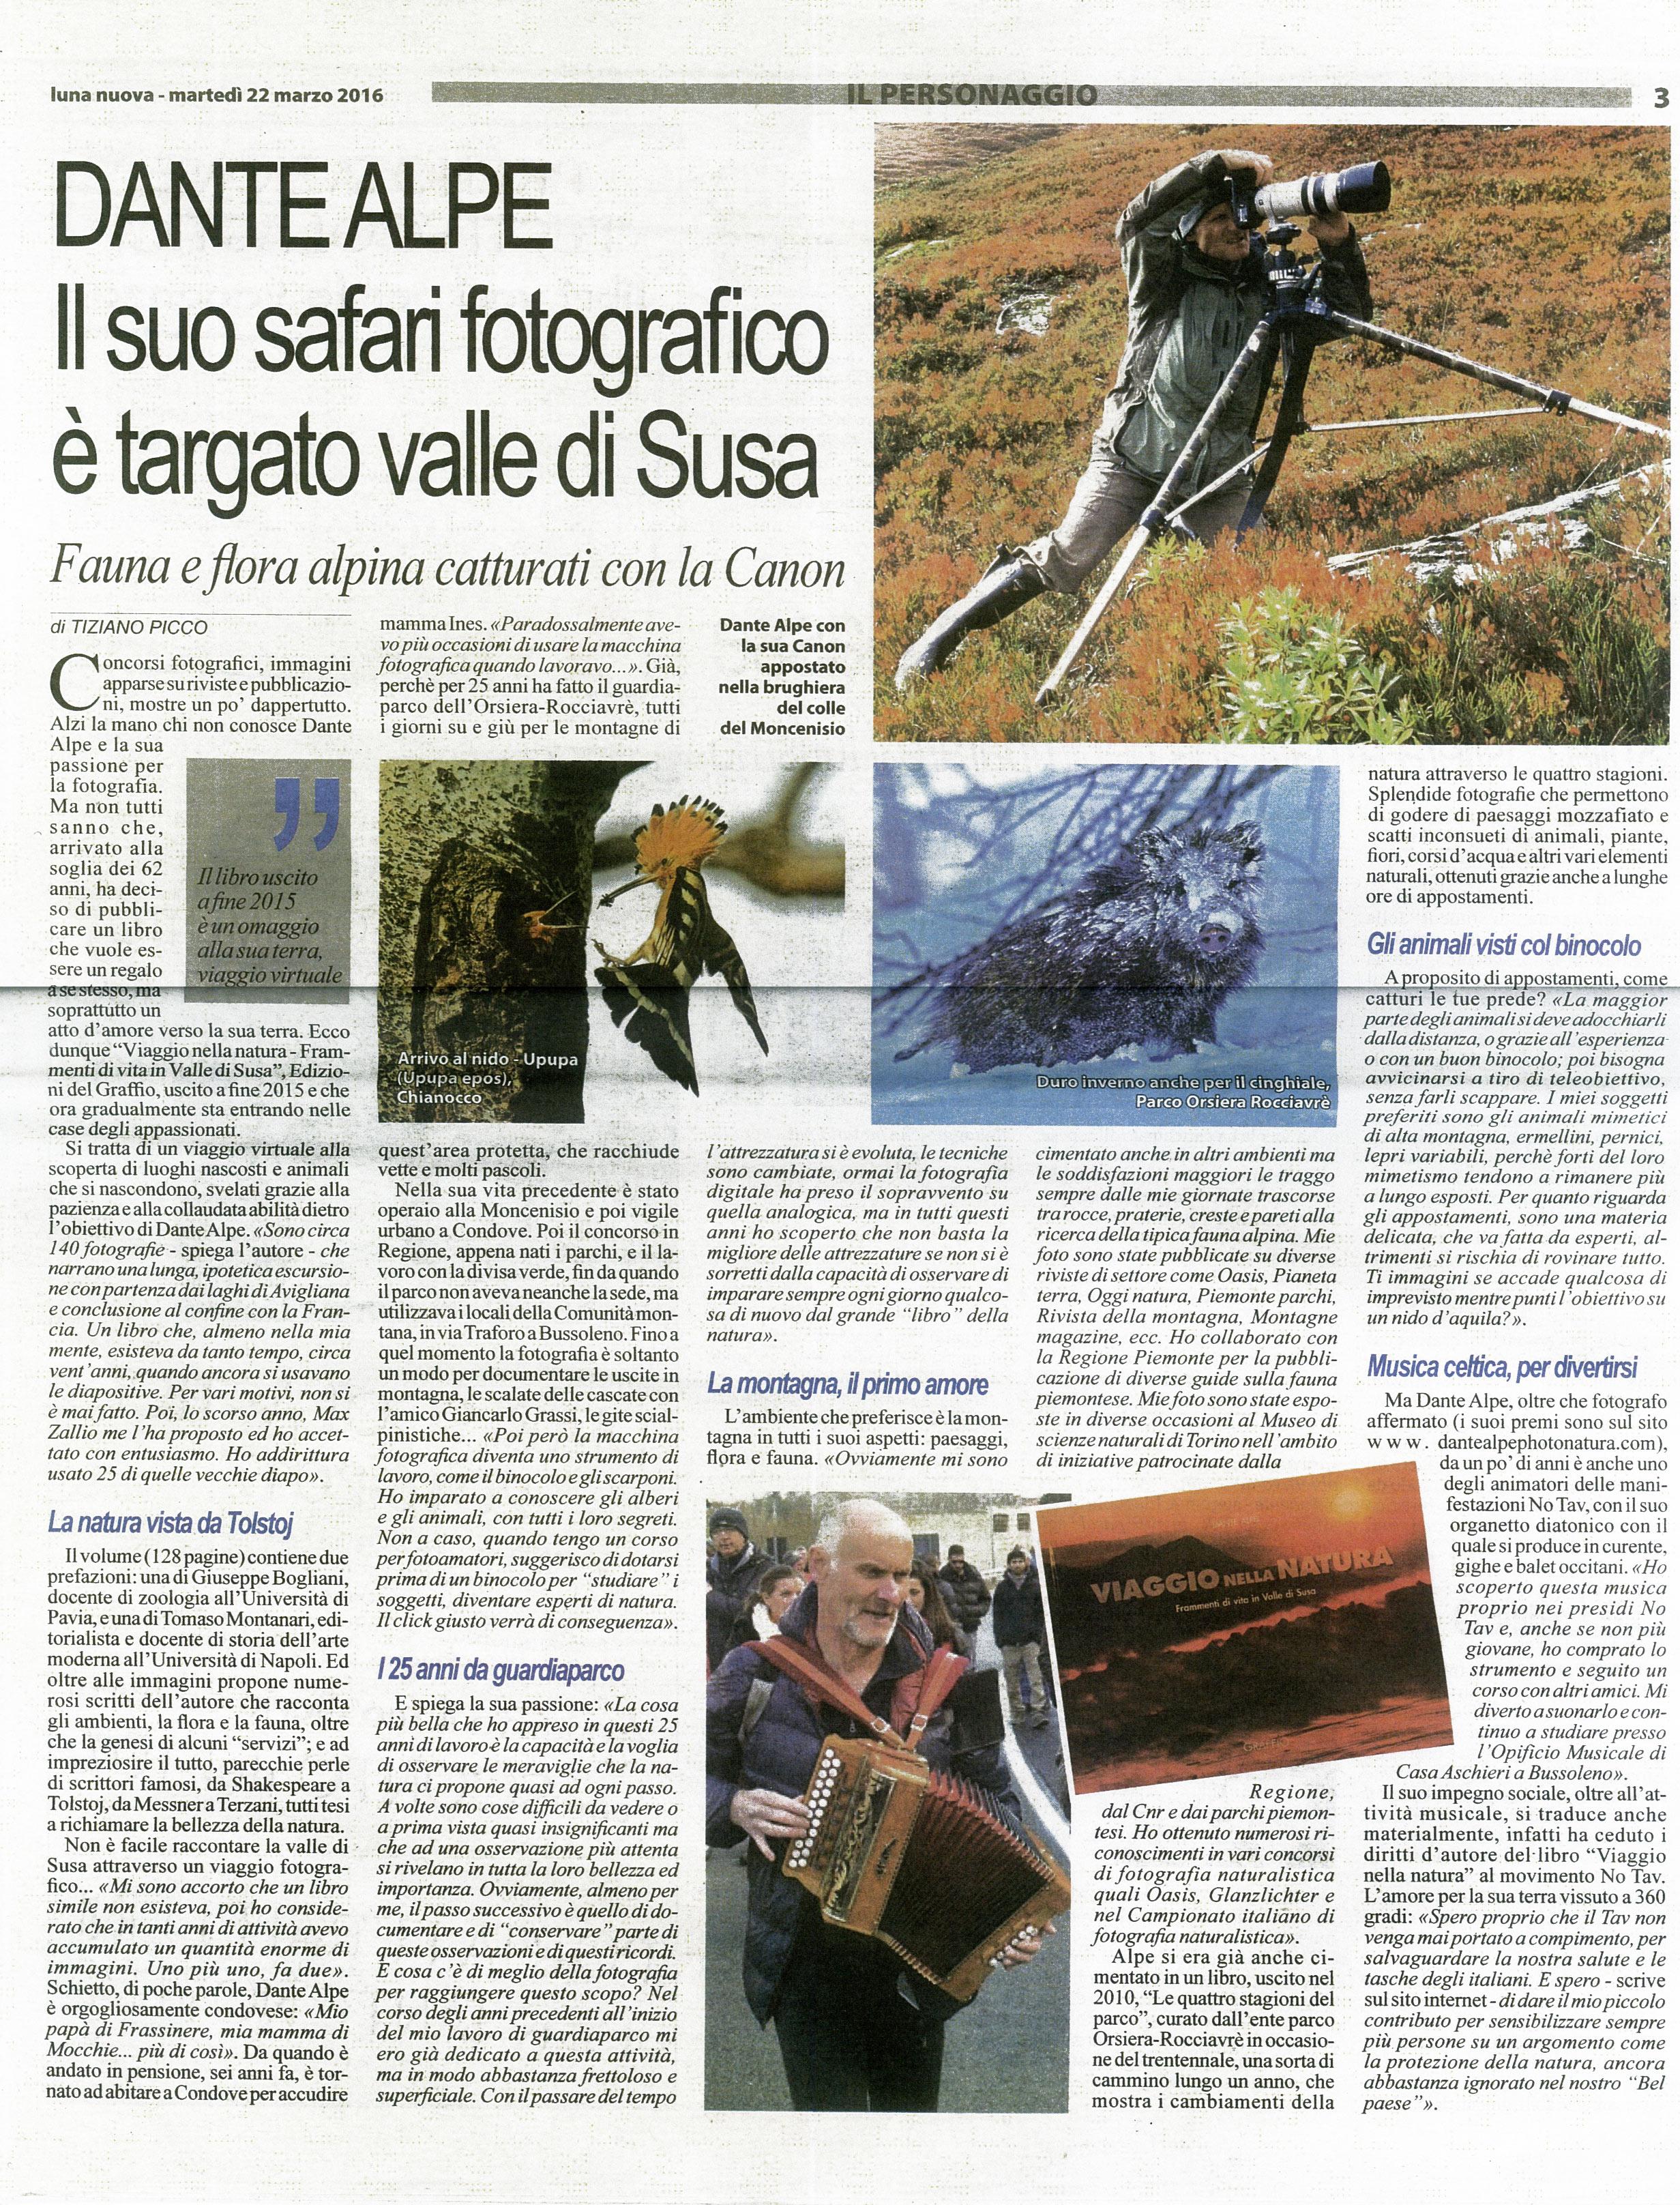 Dante Alpe su Luna Nuova